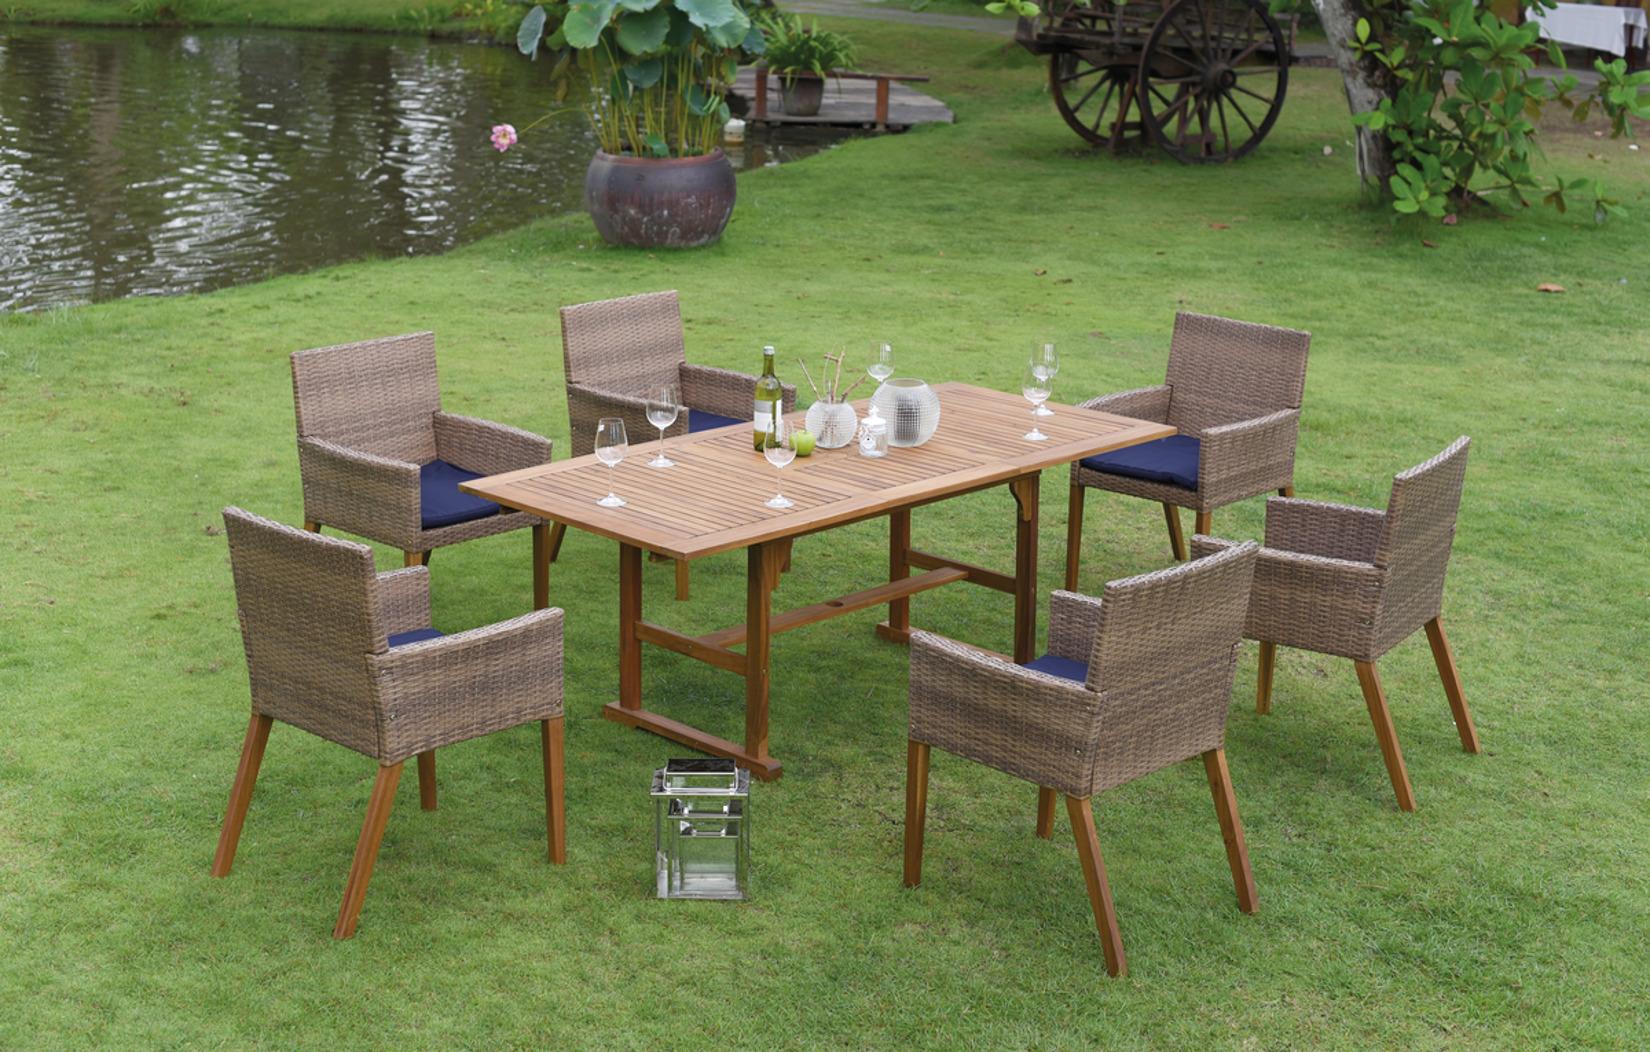 gartenm bel set consul garden rome 13 teilige sitzgruppe akazienholz braun ebay. Black Bedroom Furniture Sets. Home Design Ideas